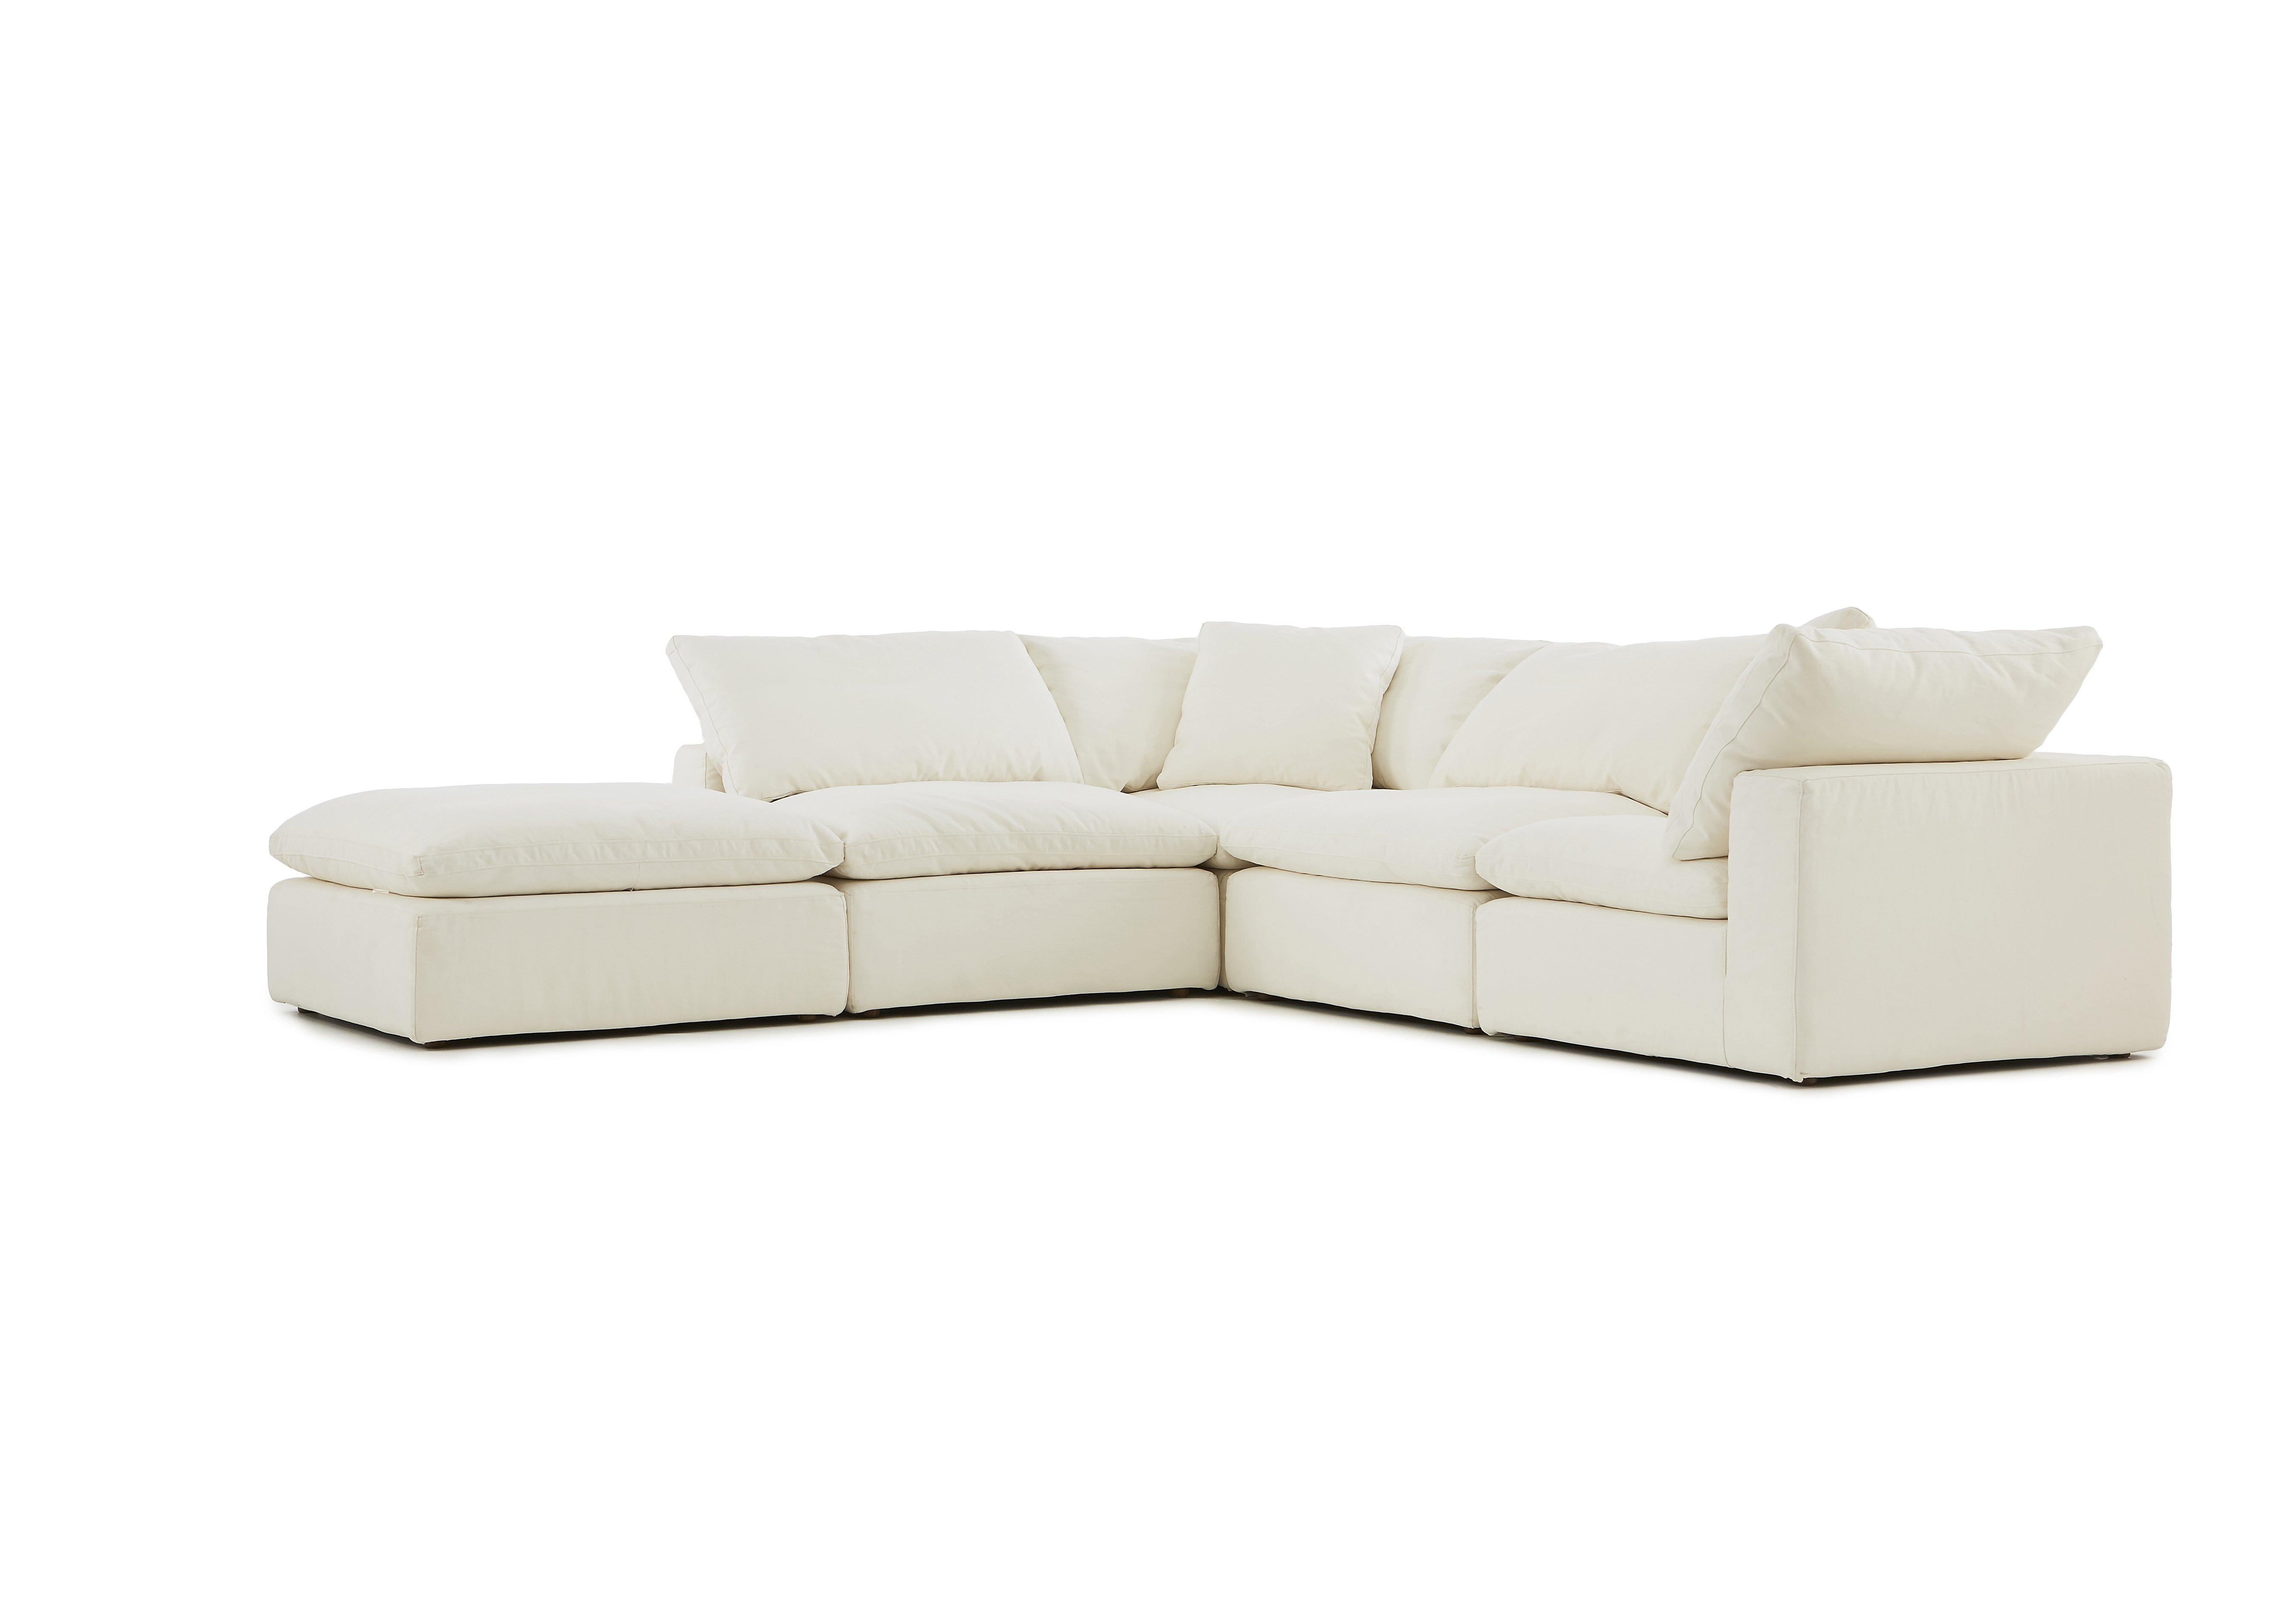 Halo Cloud Corner Sofa with Stool ly e Left Furniture Village